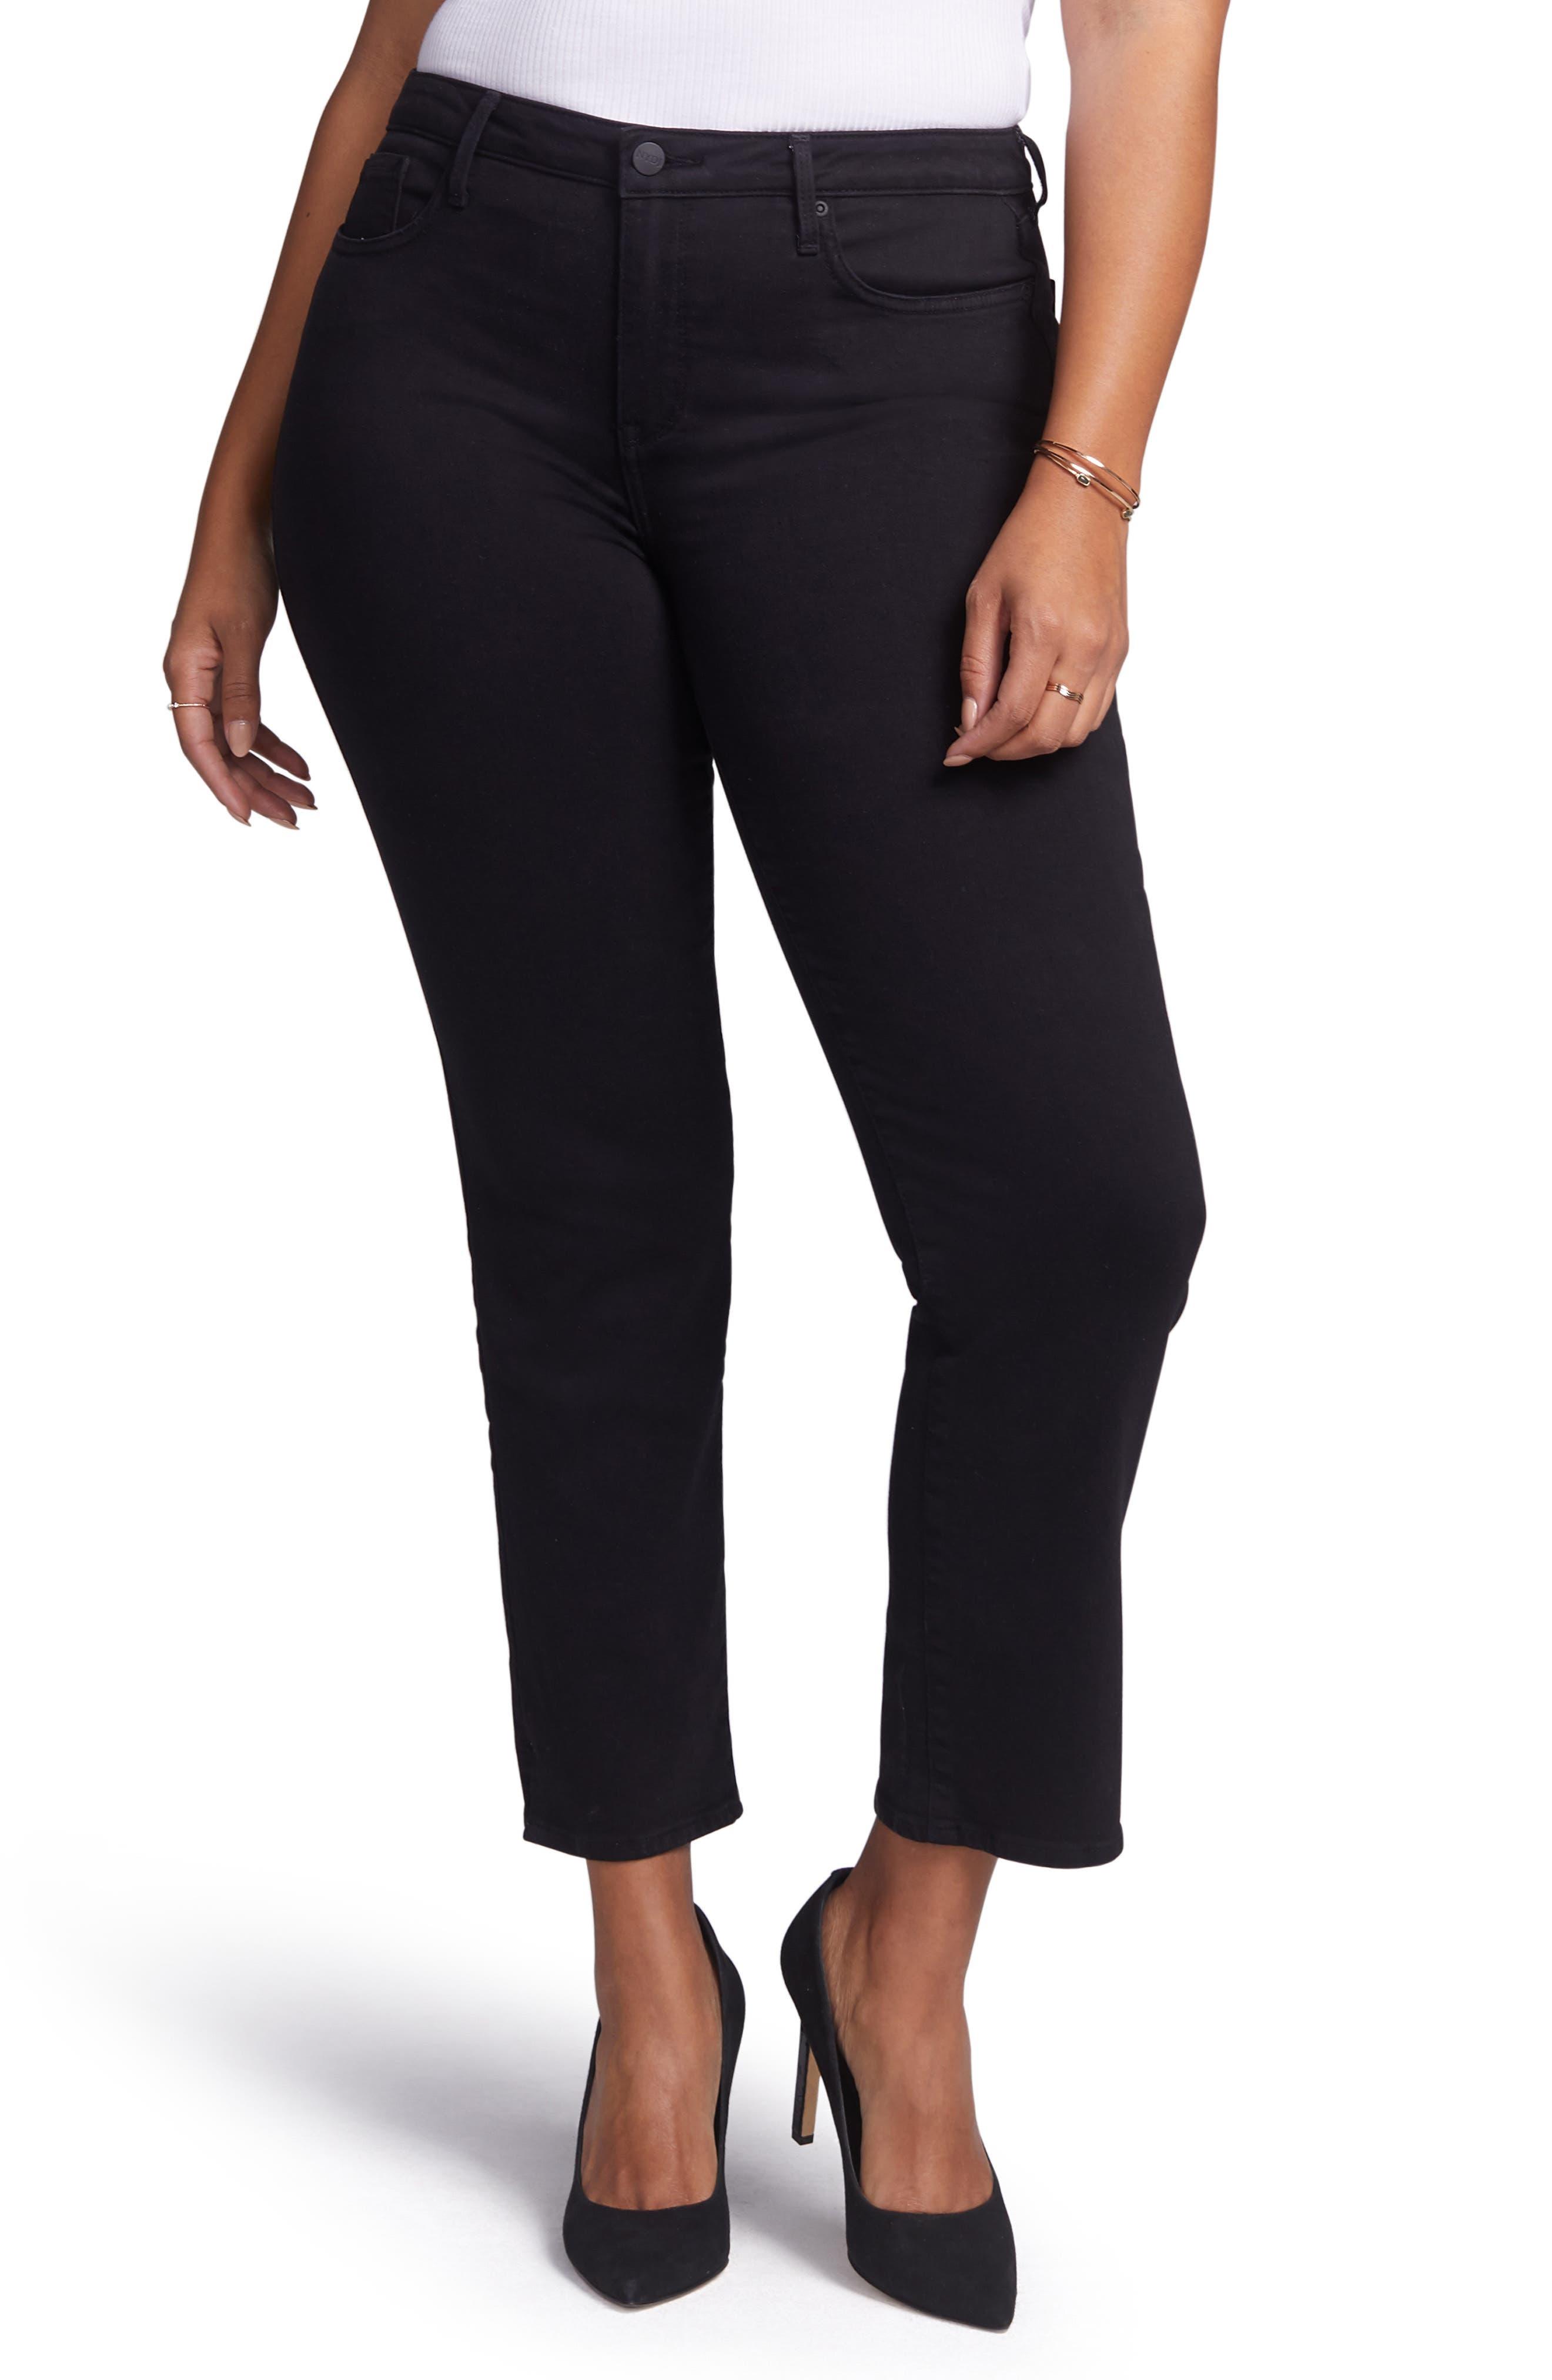 CURVES 360 BY NYDJ, Slim Straight Leg Ankle Jeans, Main thumbnail 1, color, BLACK